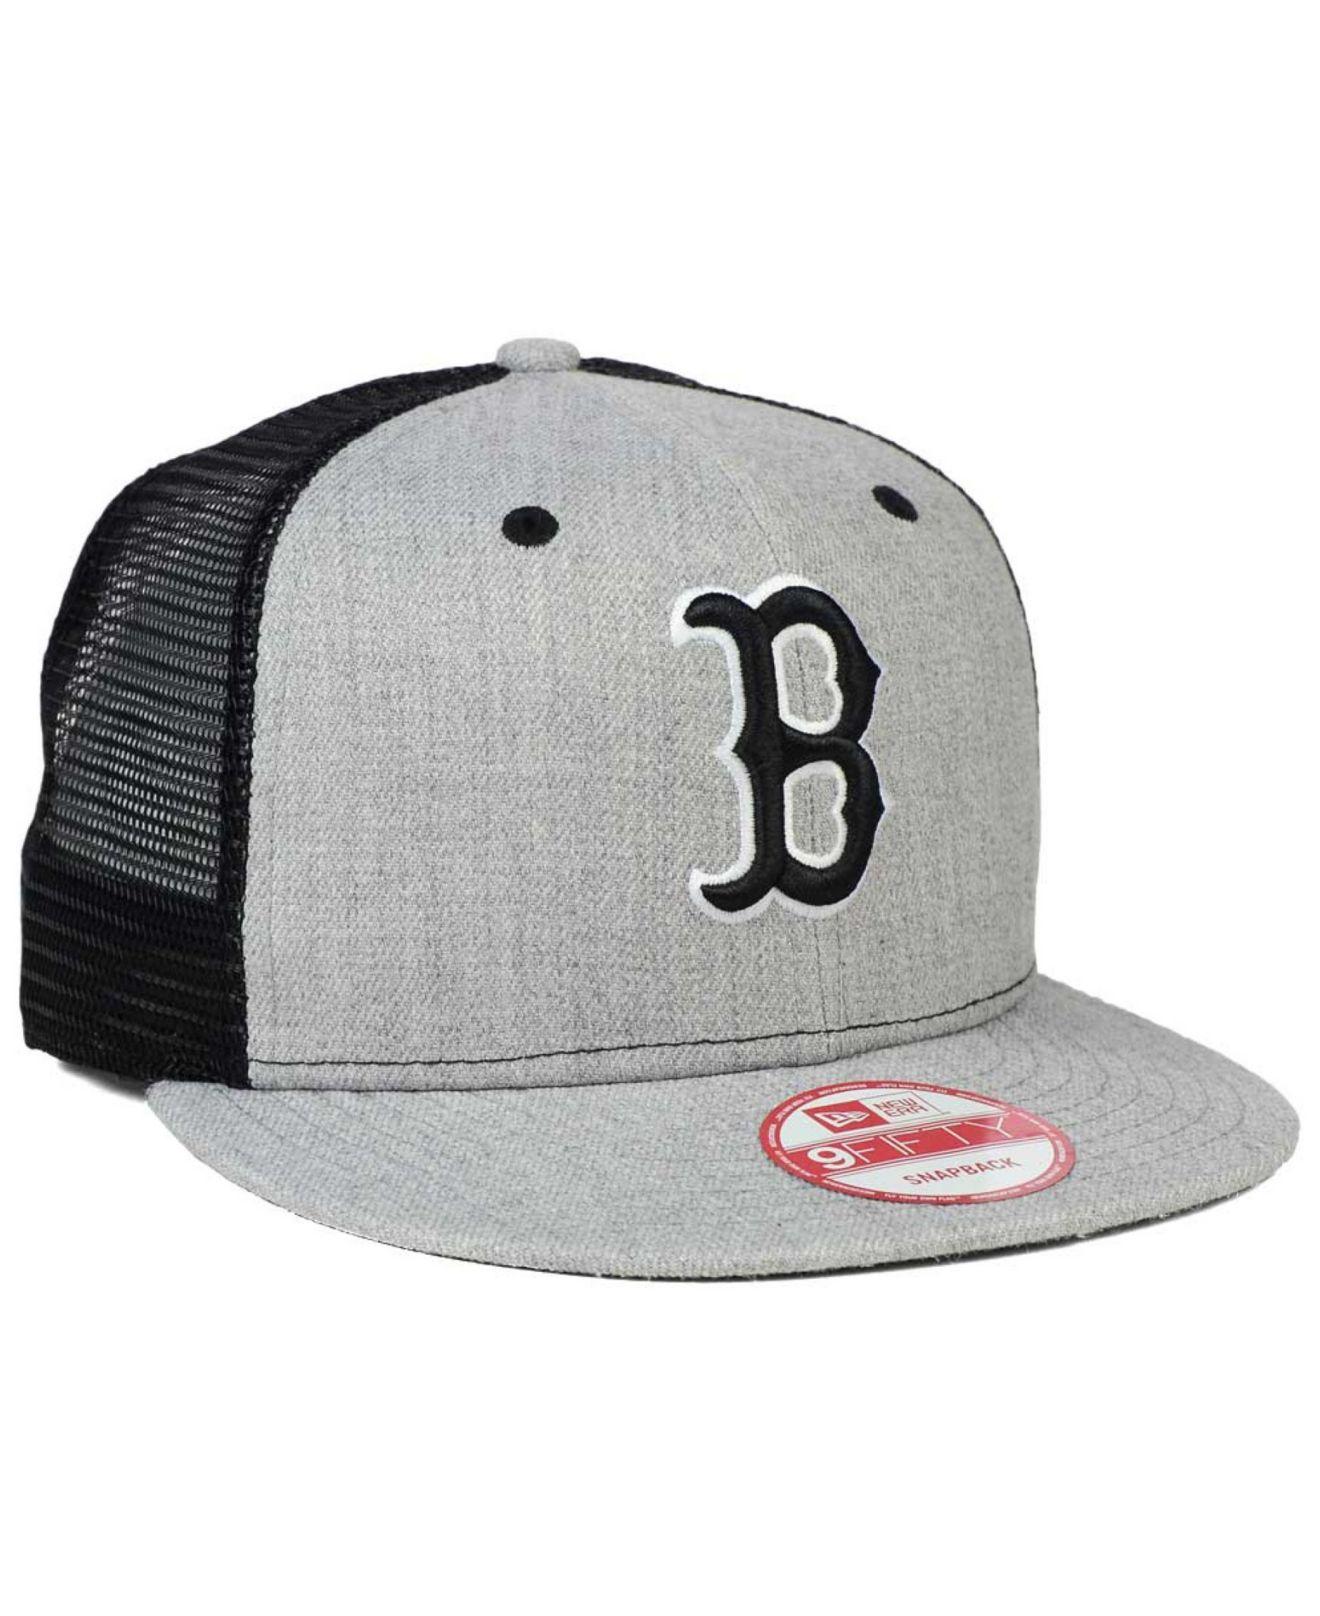 20fed455 KTZ Boston Red Sox Heather Trucker 9fifty Snapback Cap in Gray for ...